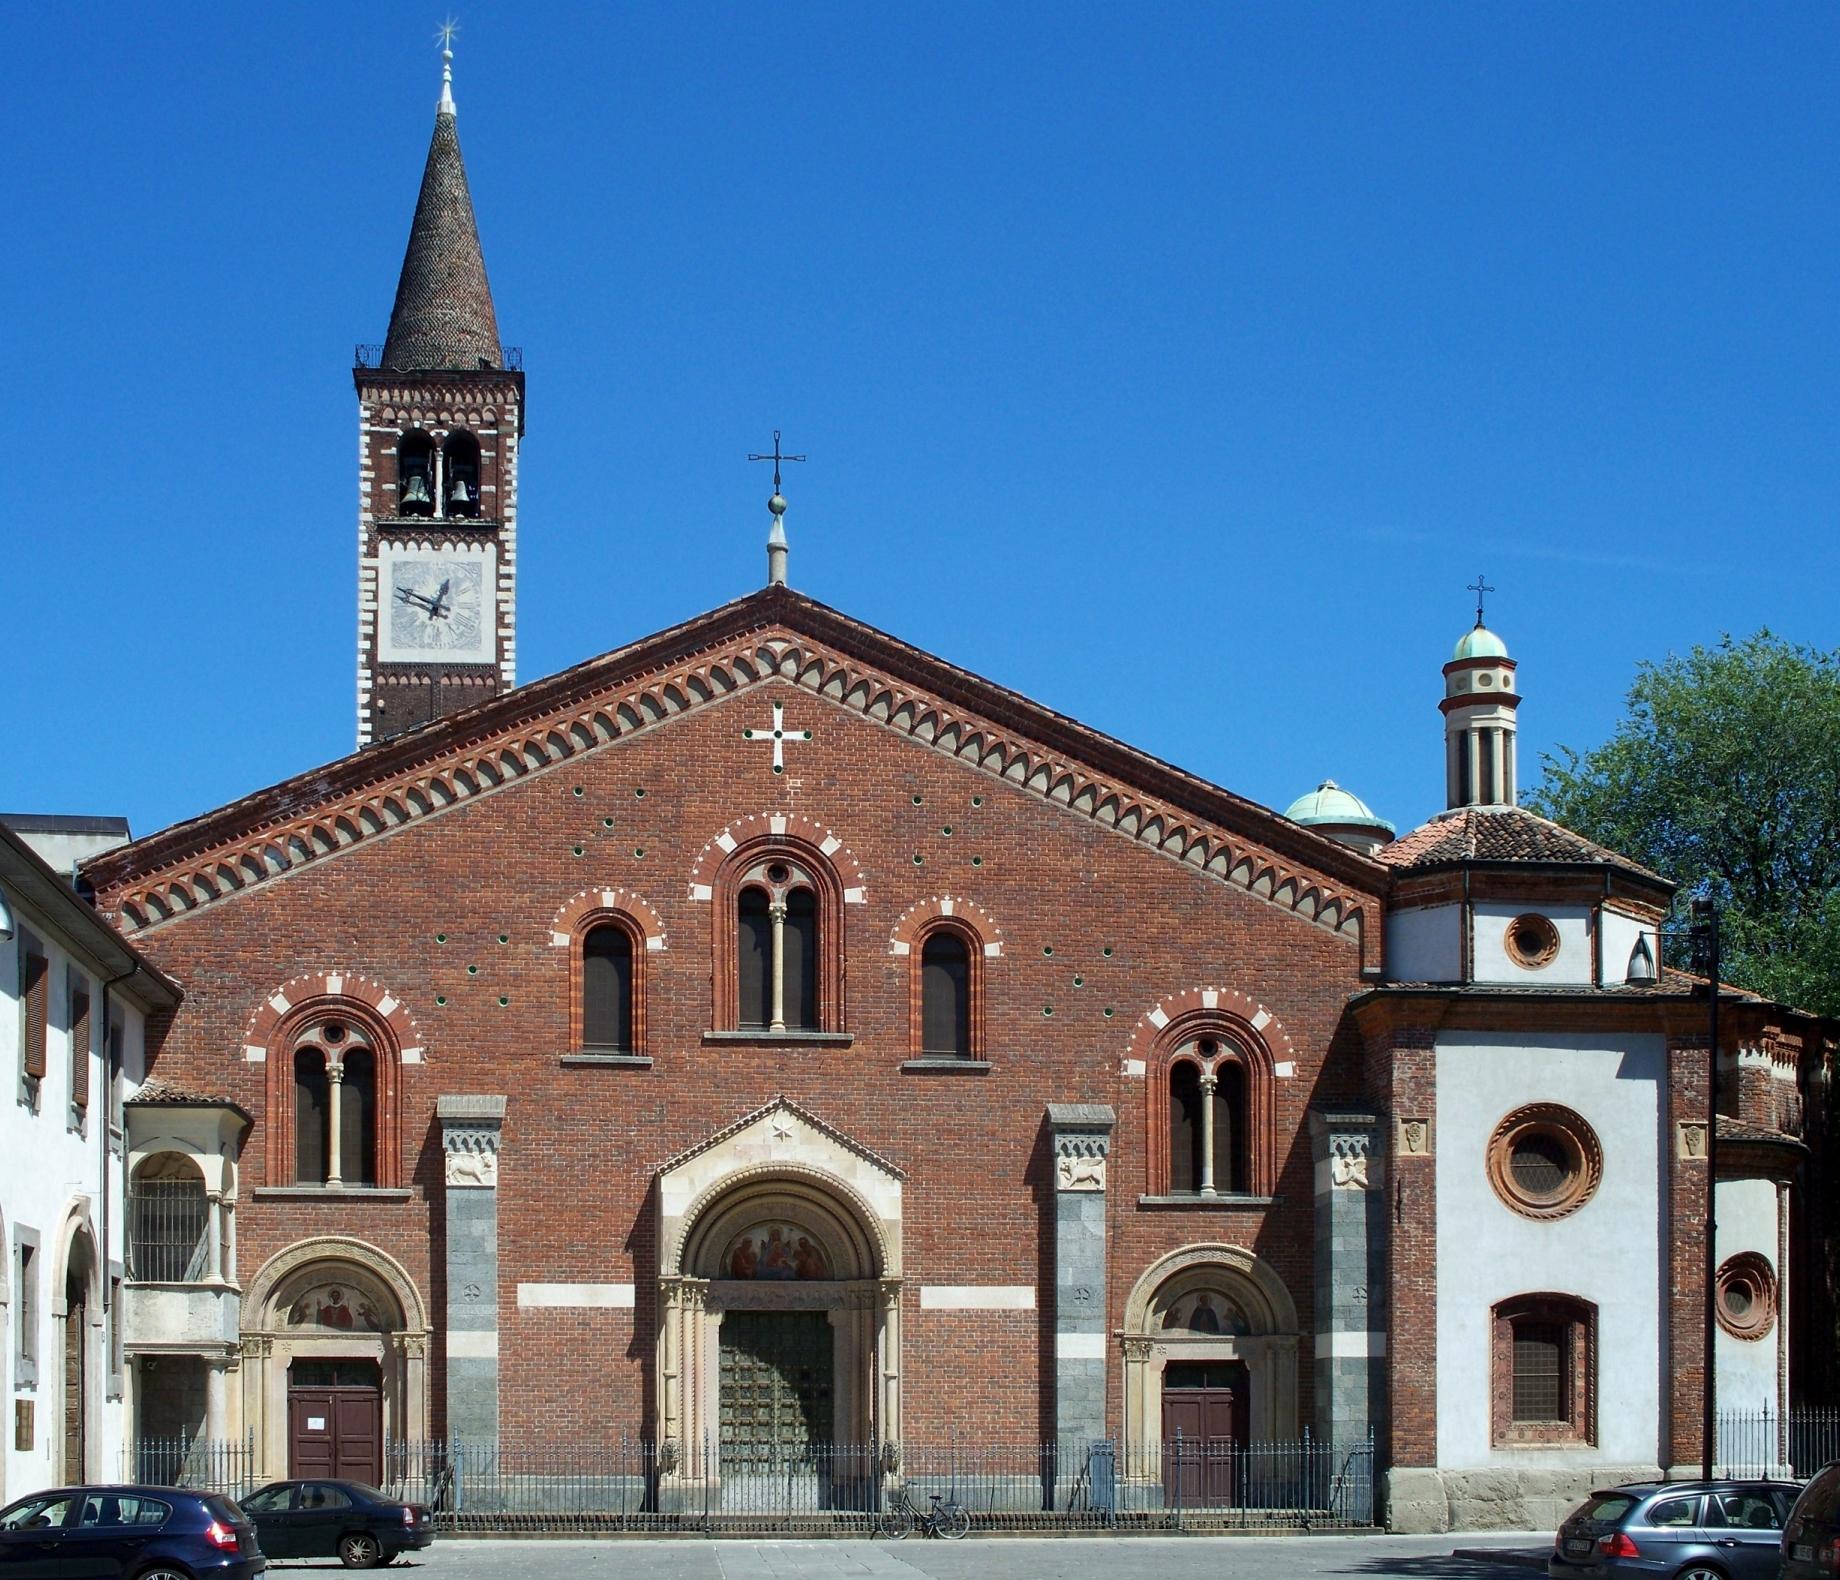 file facade of sant 39 eustorgio in wikimedia commons